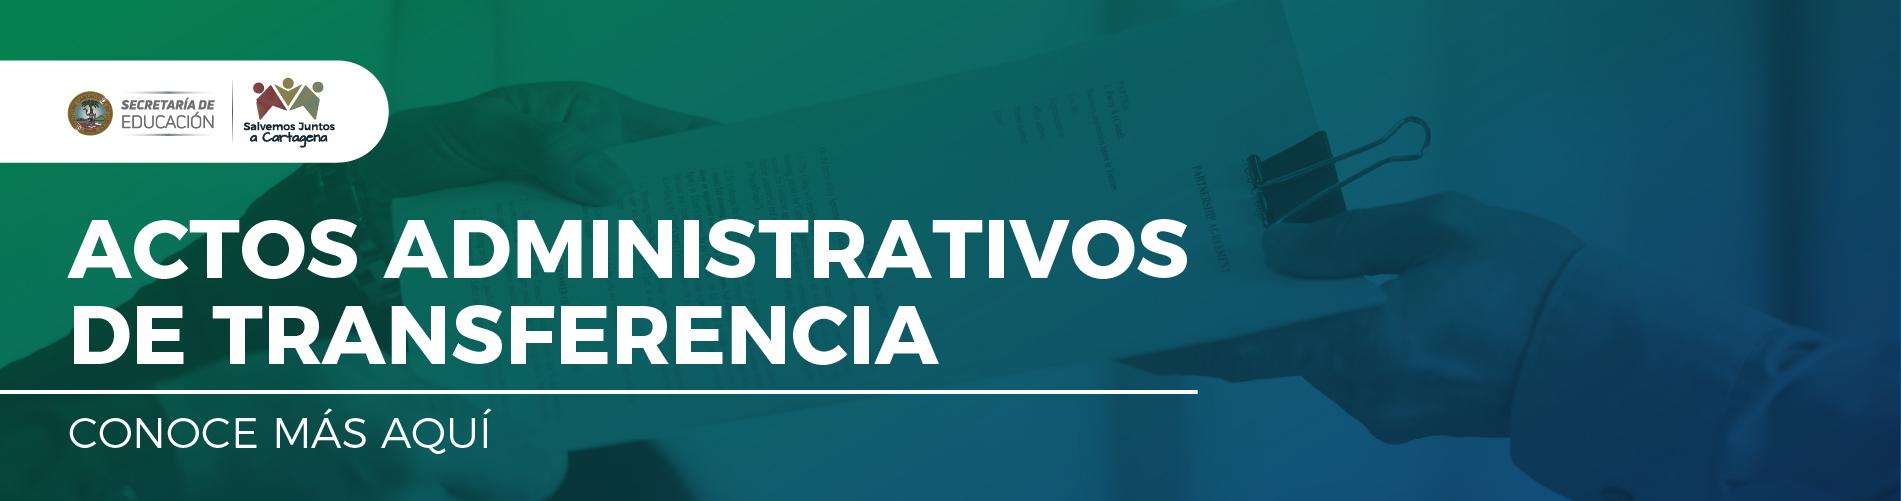 Banner-Actos-administrativos-de-transferencia